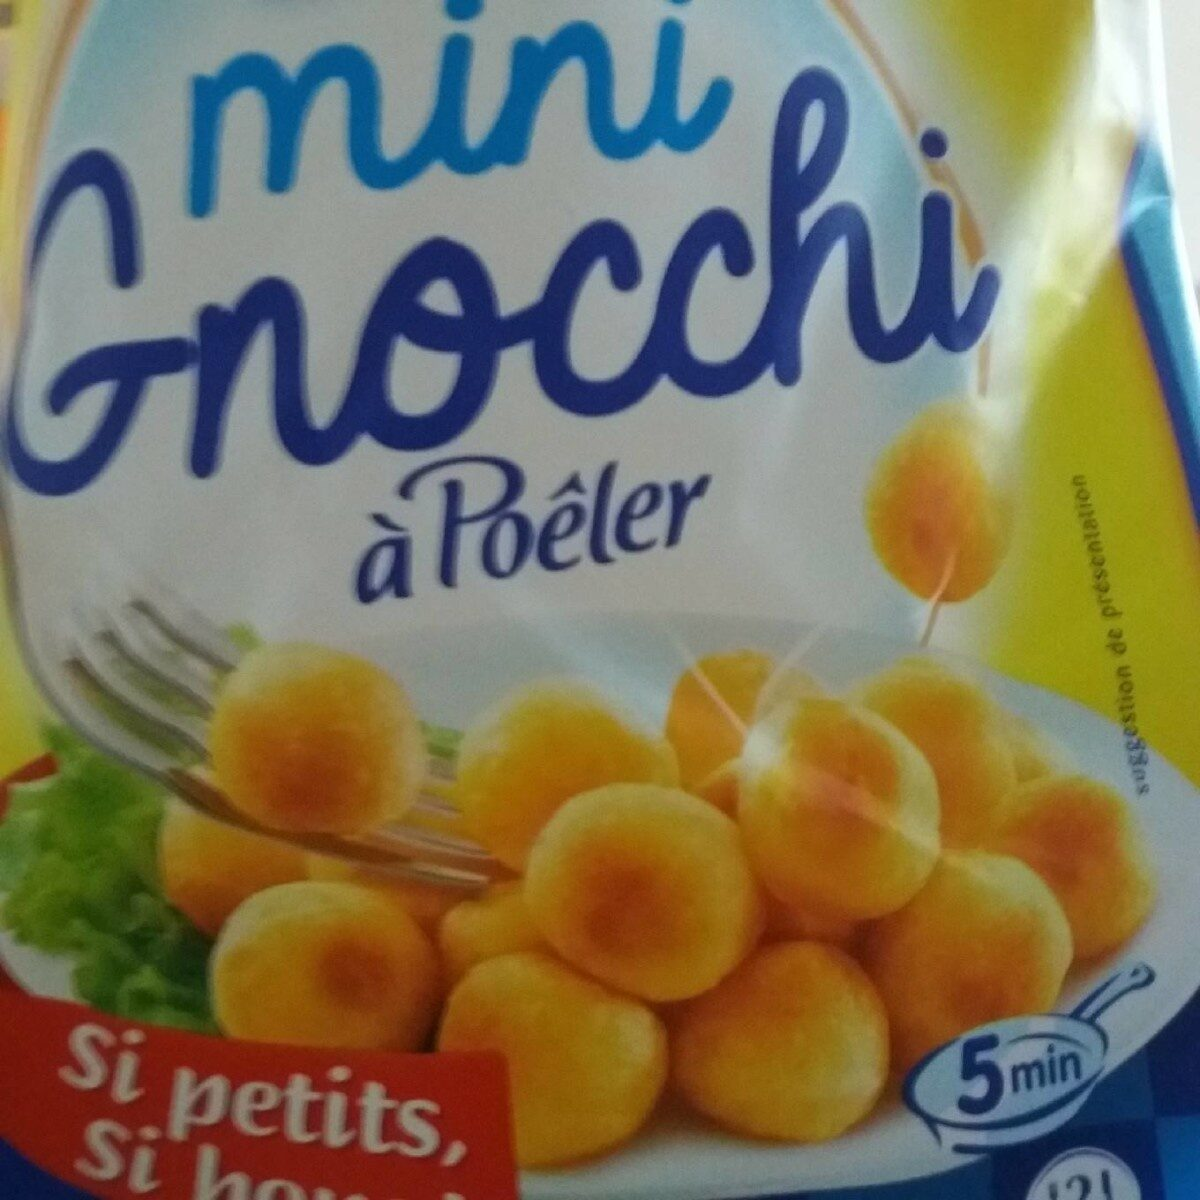 Mini gnocchi a poeler 300g lustucru - Informations nutritionnelles - fr